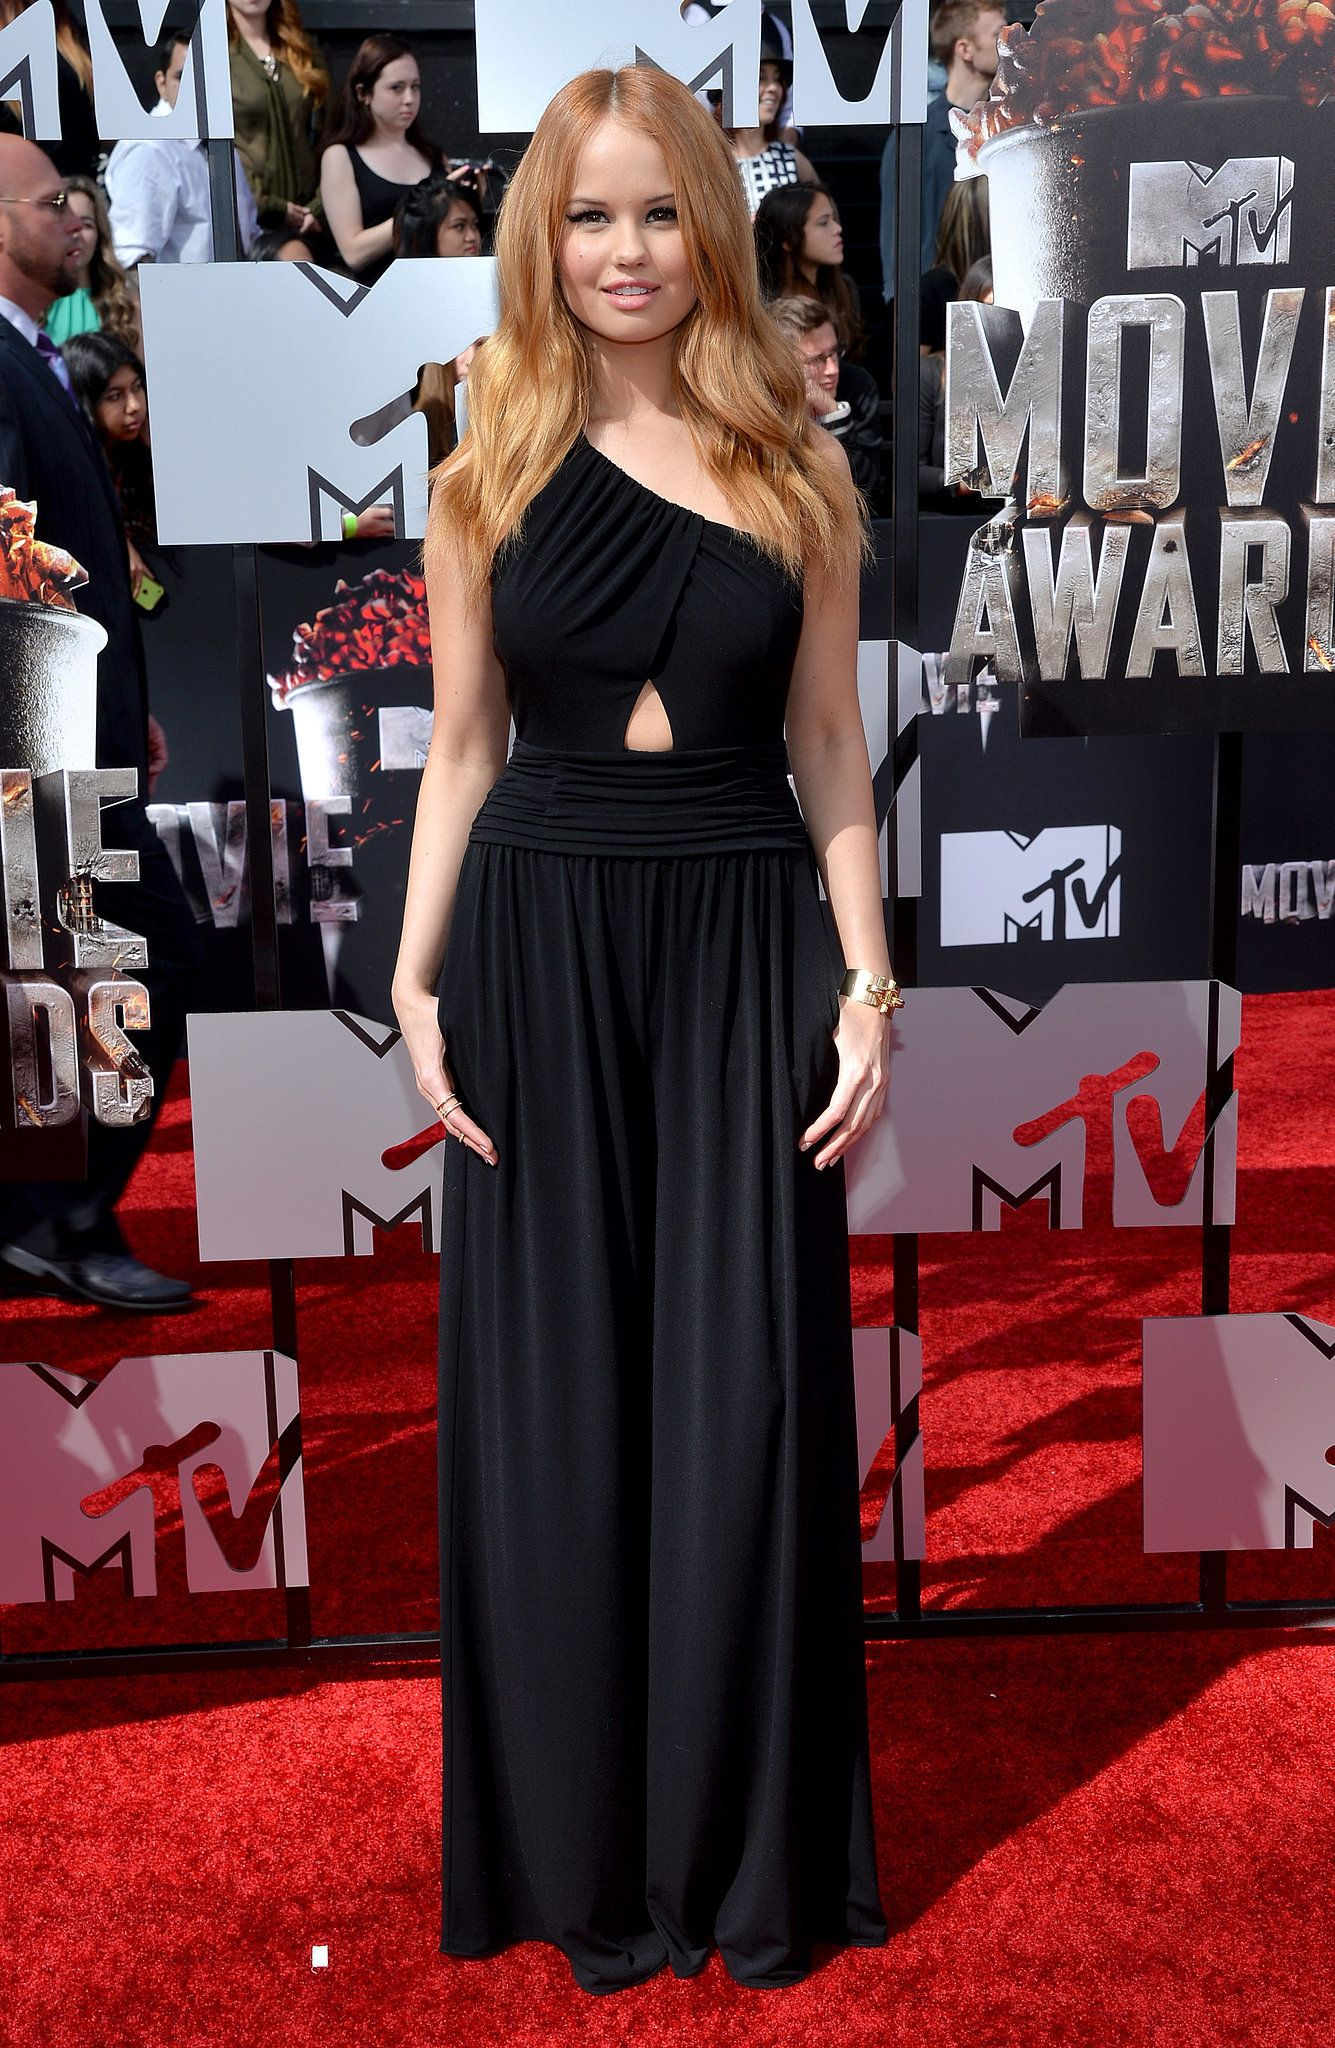 Debby Ryan at the 2014 MTV Movie Awards Celebrity